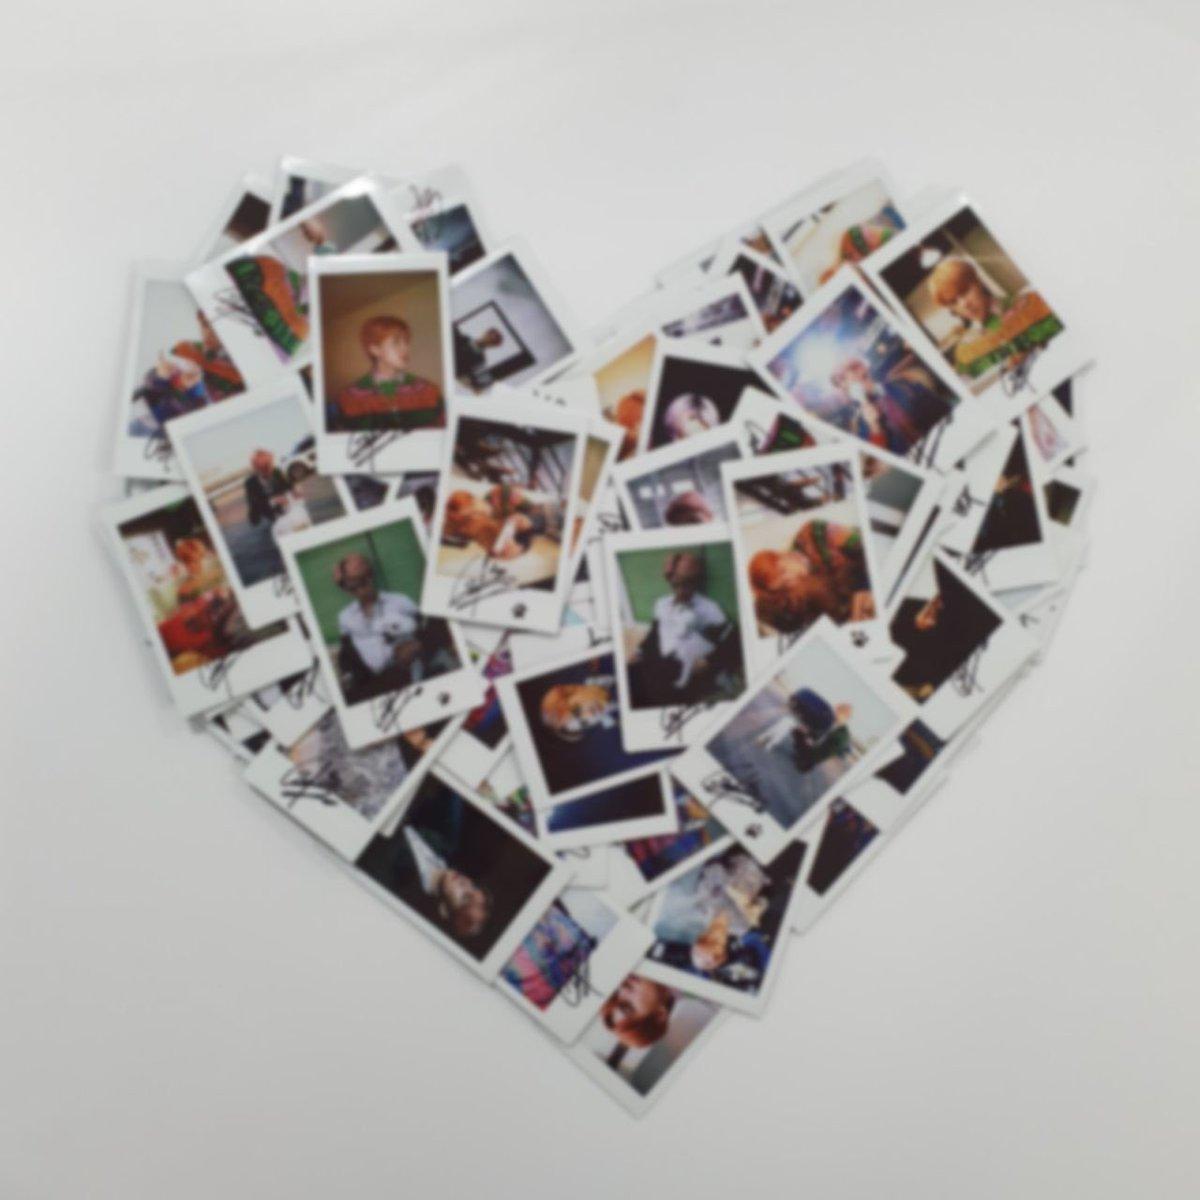 sehun's polaroid event ㅠㅠ <br>http://pic.twitter.com/saj7a0gcTC